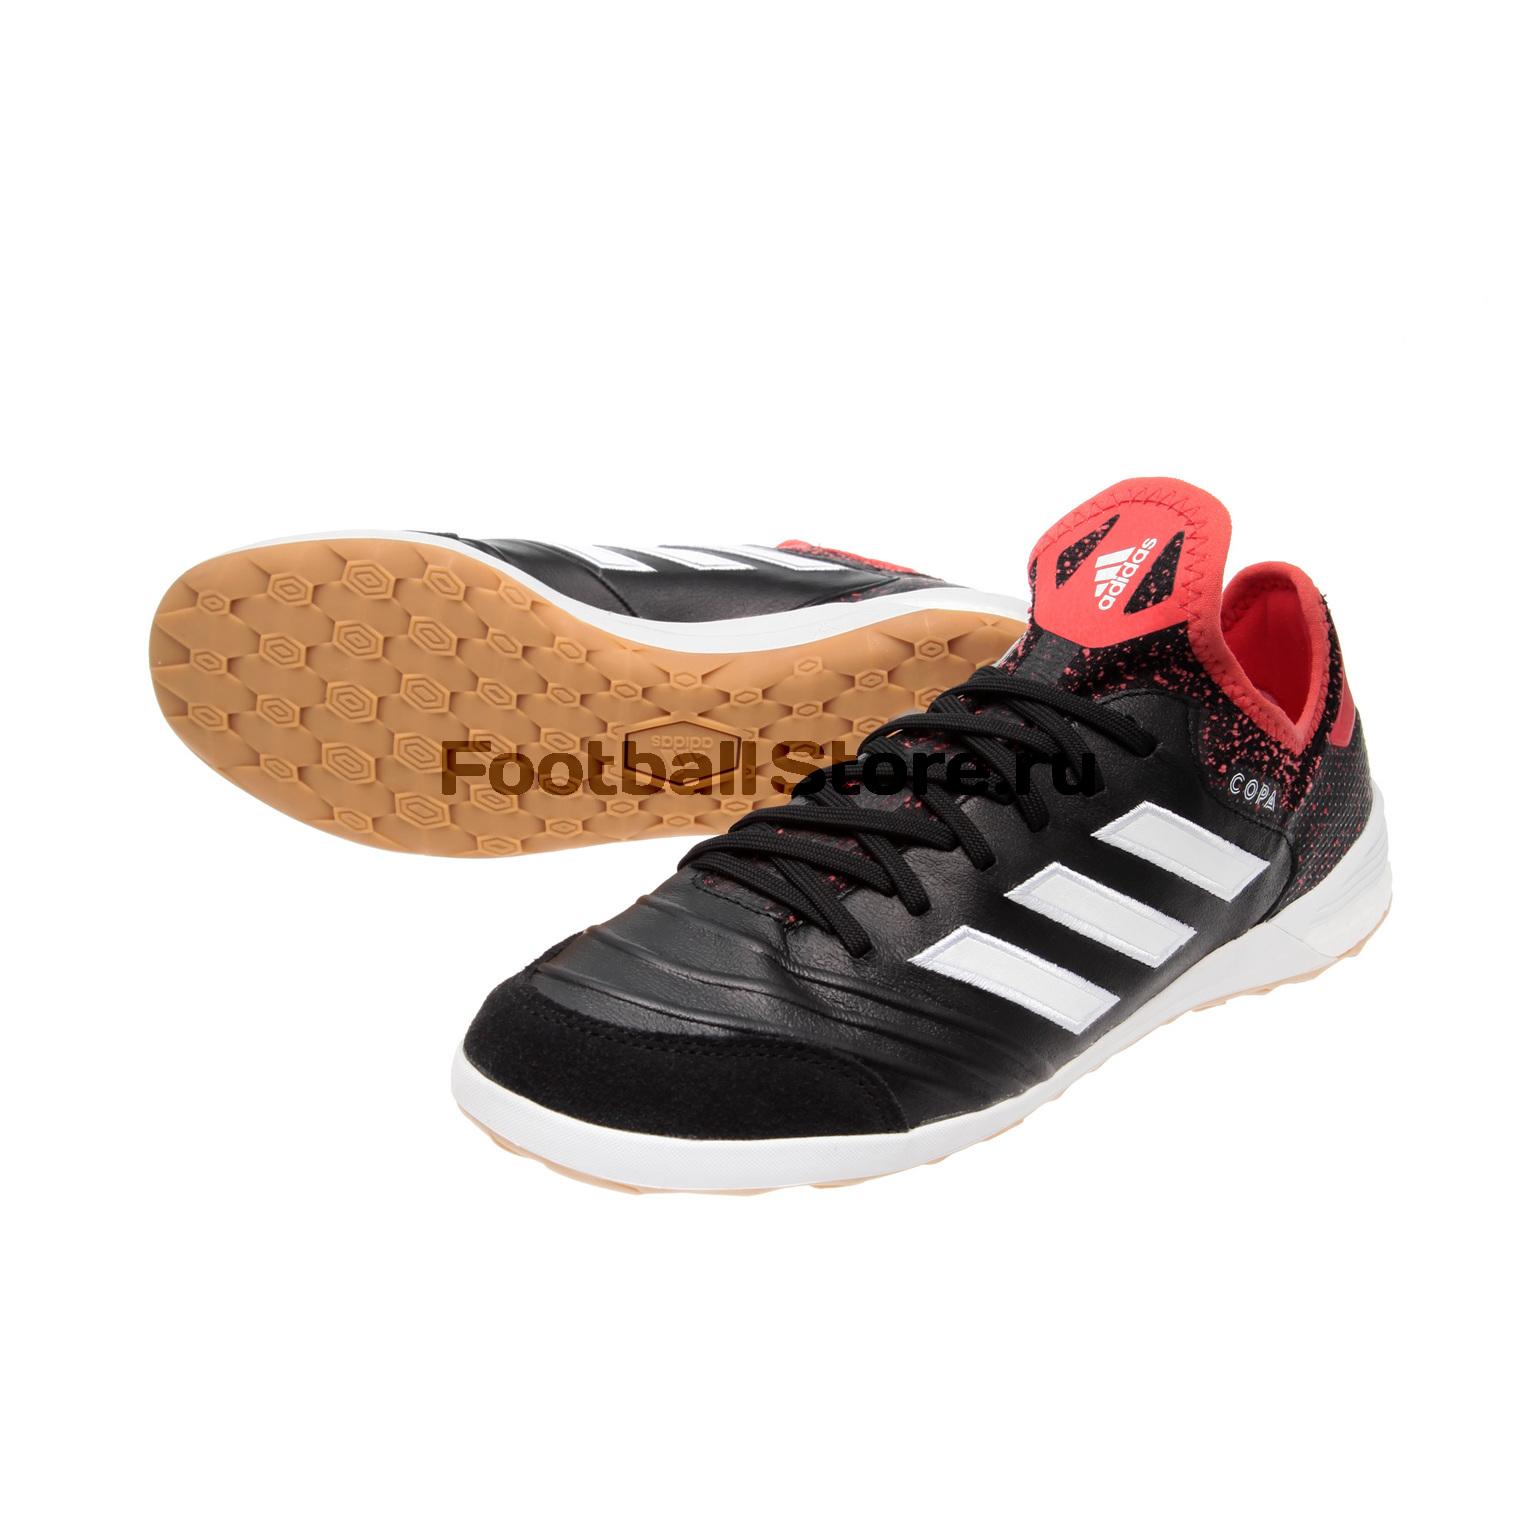 d66ed20828a4 Обувь для зала Adidas Copa Tango 18.1 IN CP8981 – купить футзалки в интернет  магазине footballstore, цена, фото